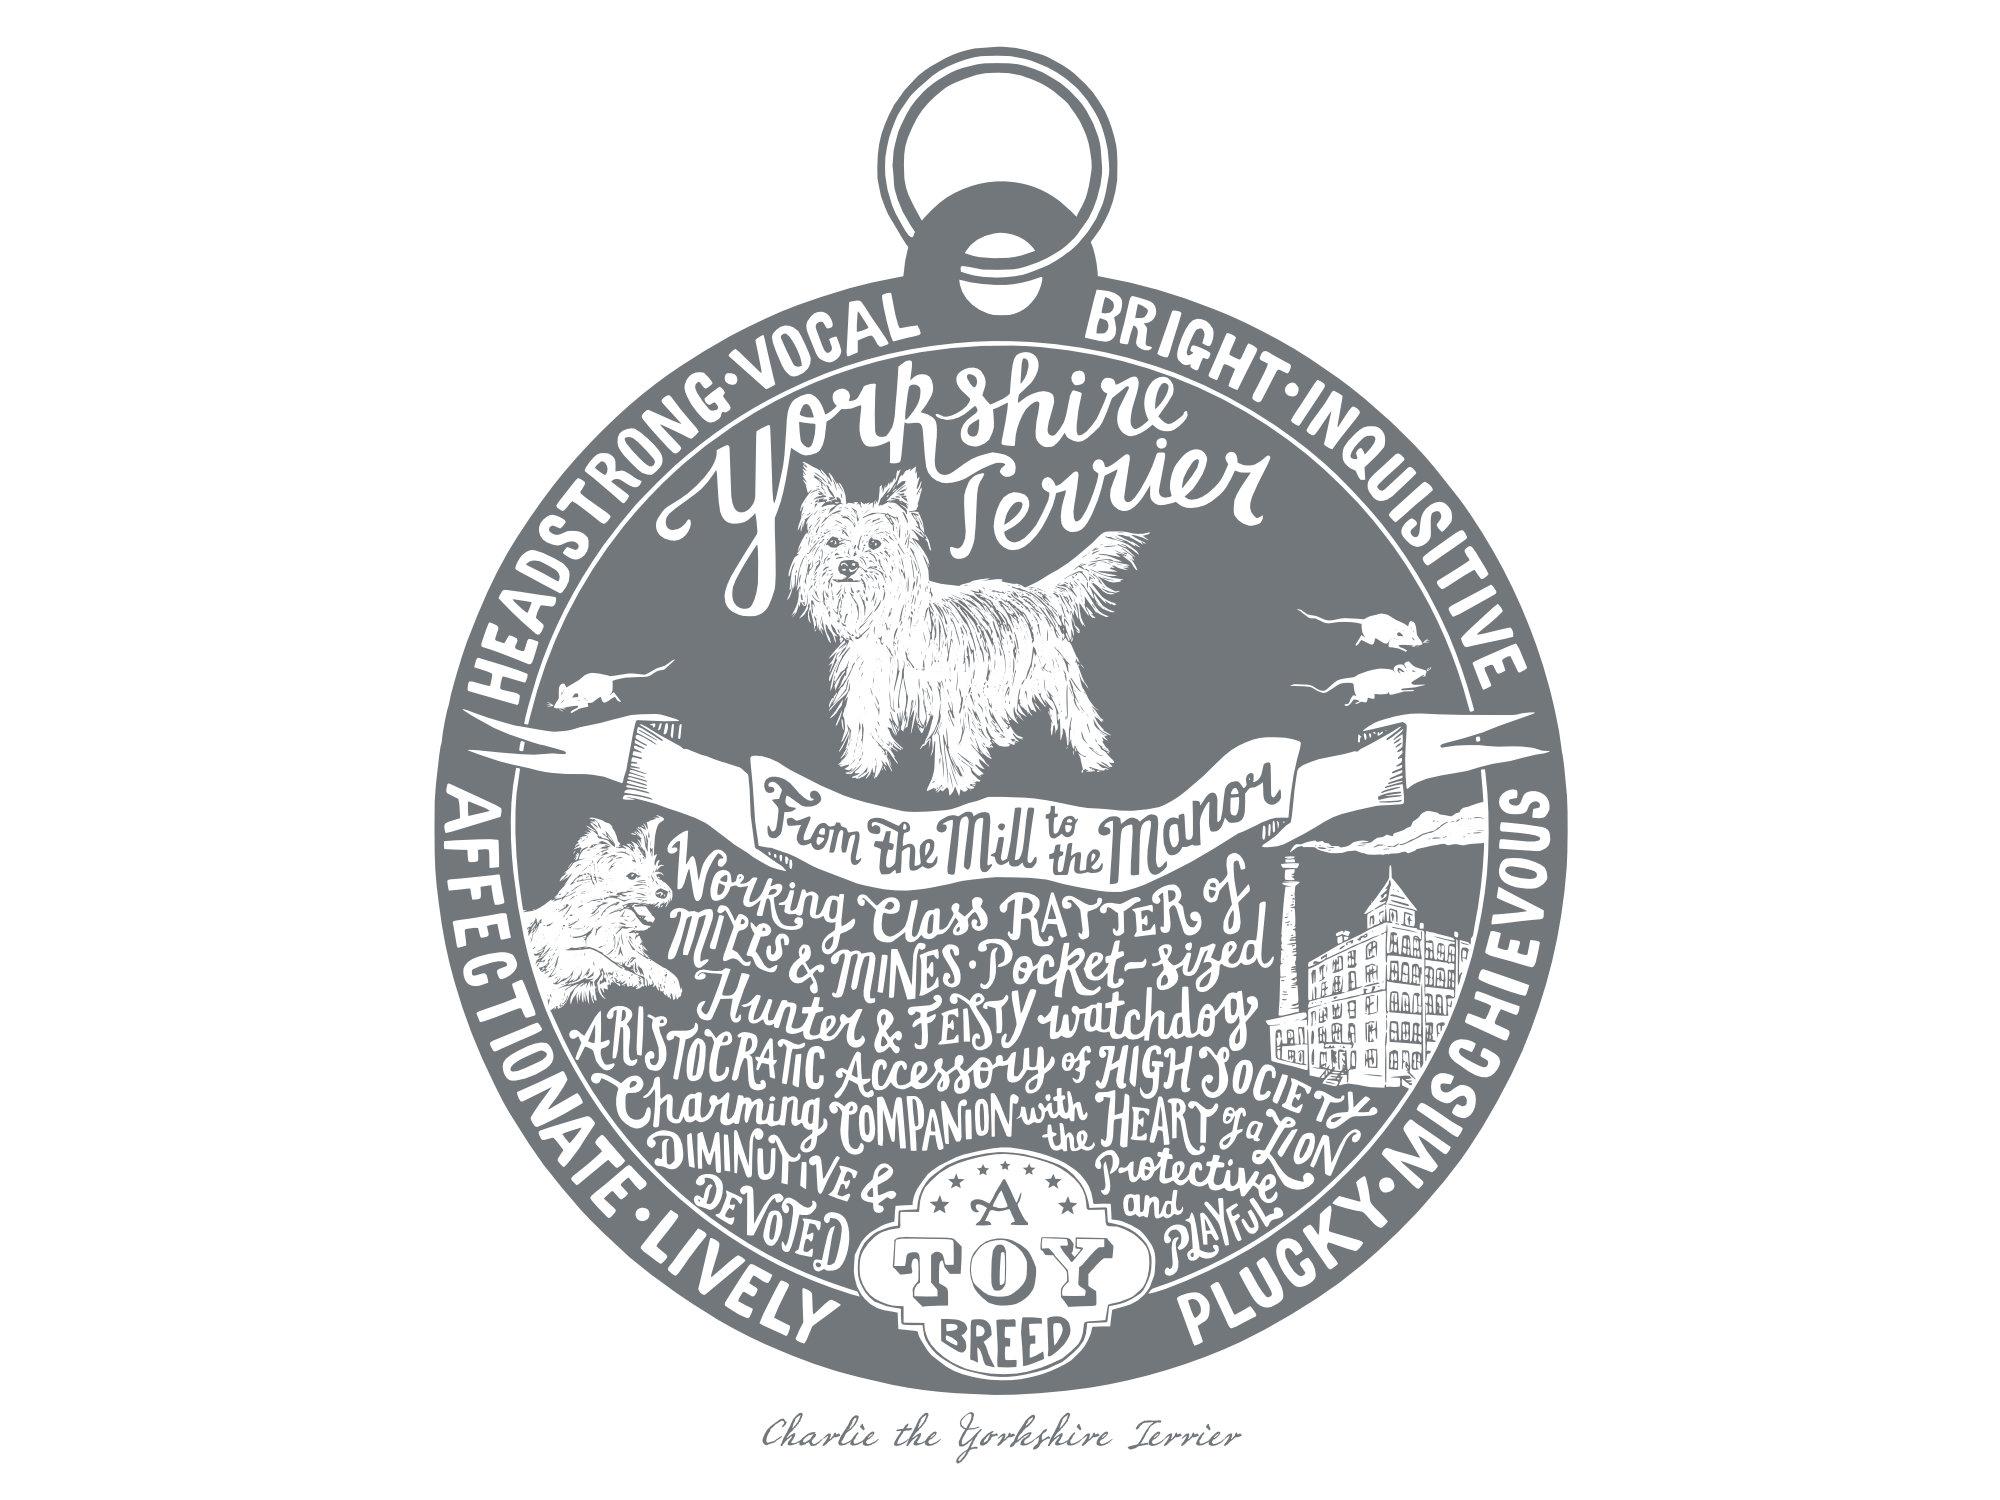 Yorkshire terrier prints - Hand lettering & Illustration by Debbie Kendall